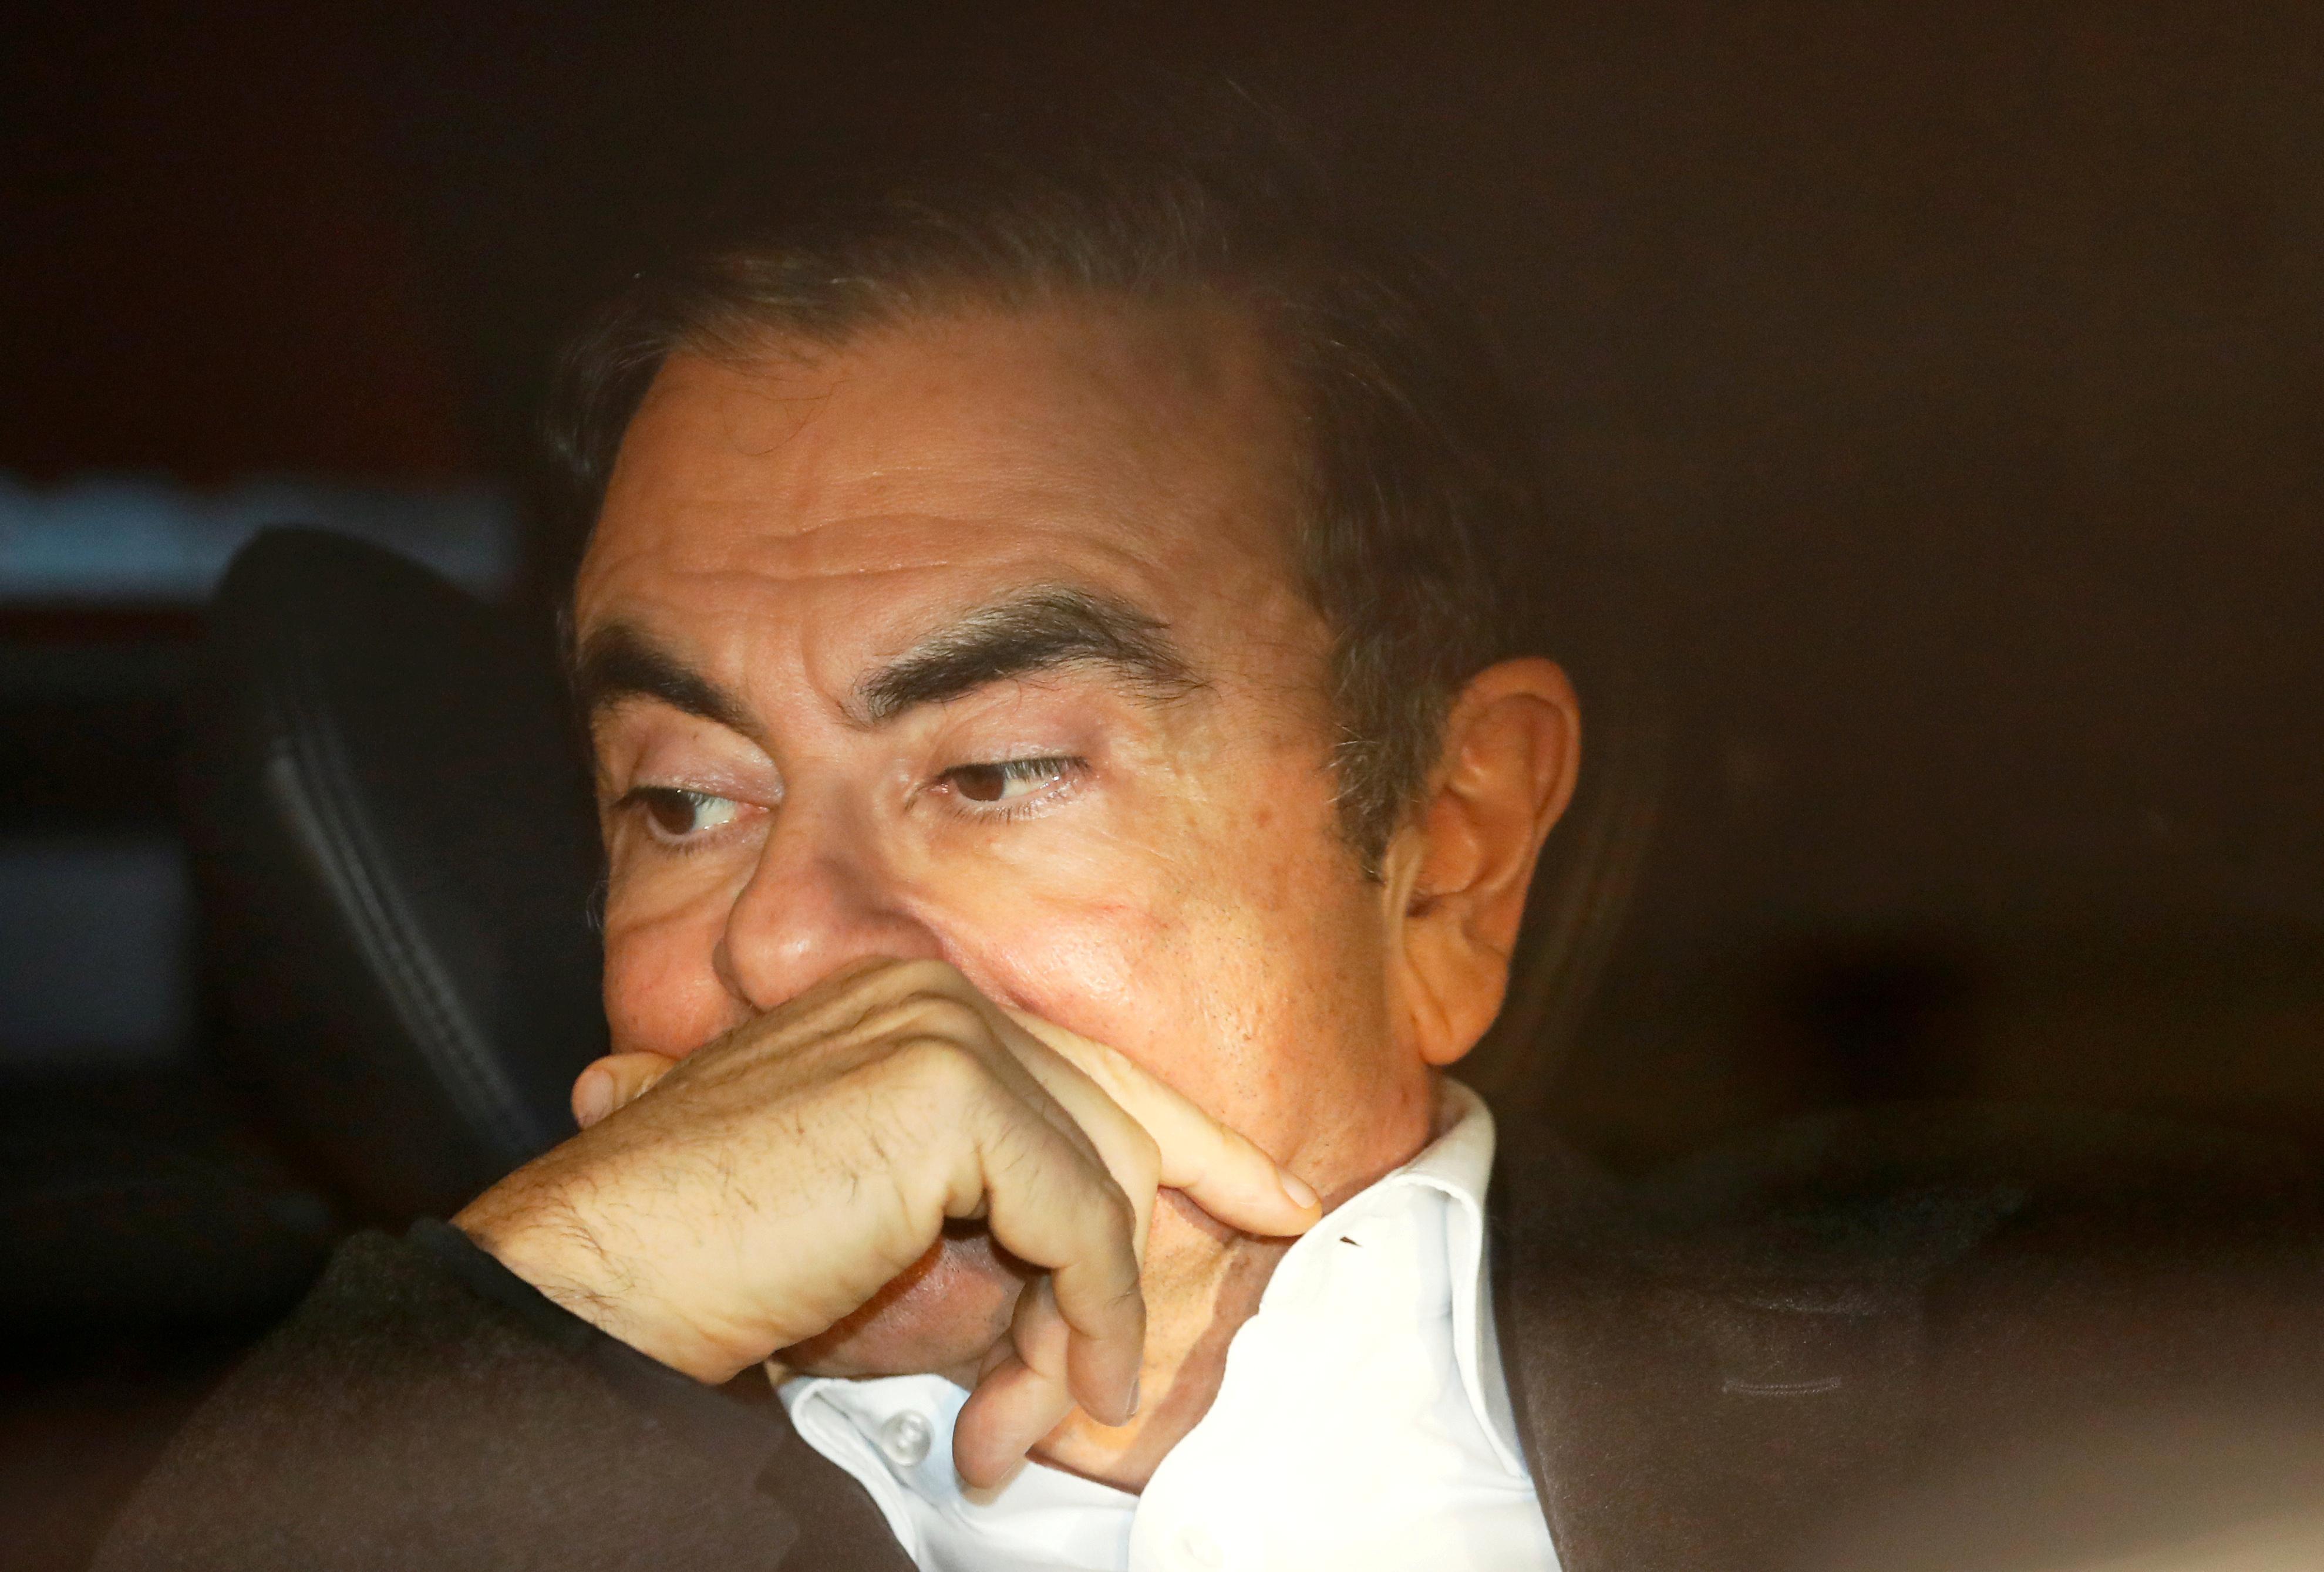 Exclusive: Renault alerts prosecutors to Oman dealer payments under...